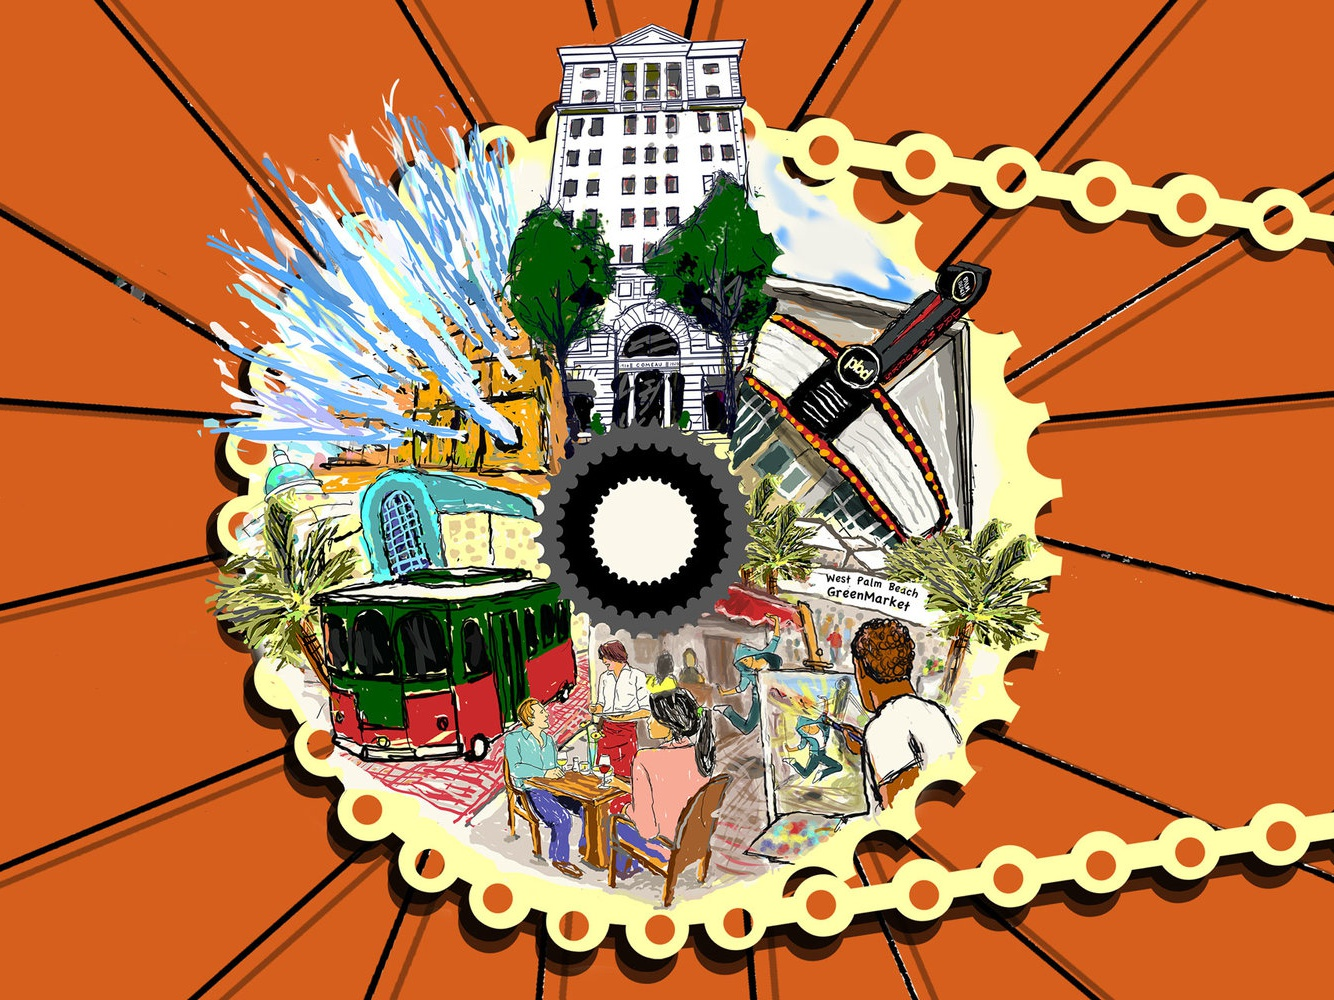 Skybike Poster detail west palm beach detail artwork illustration